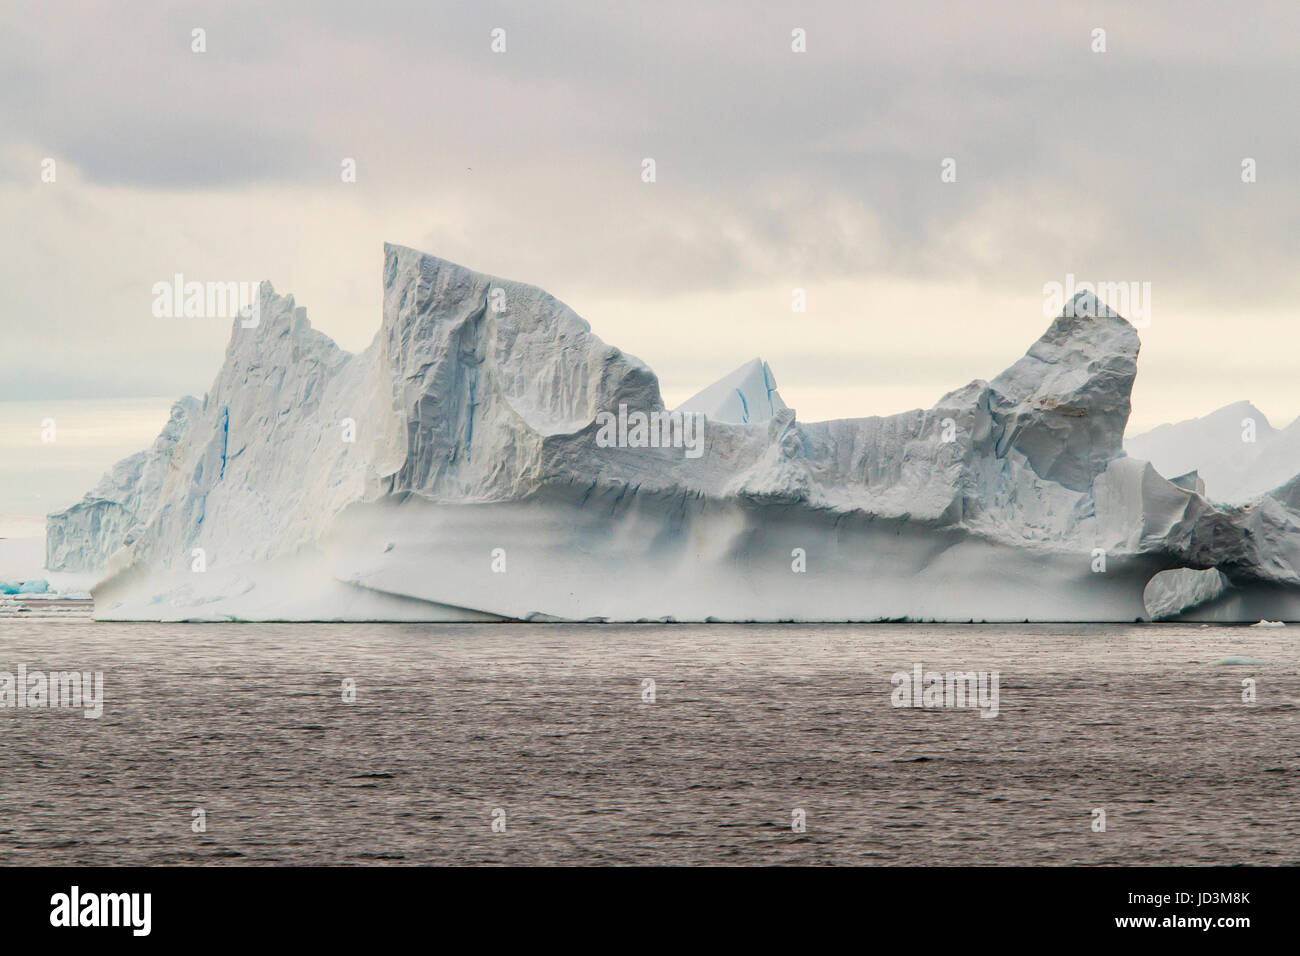 Antarctica landscape with blue ice iceberg, ice berg, icebergs. - Stock Image